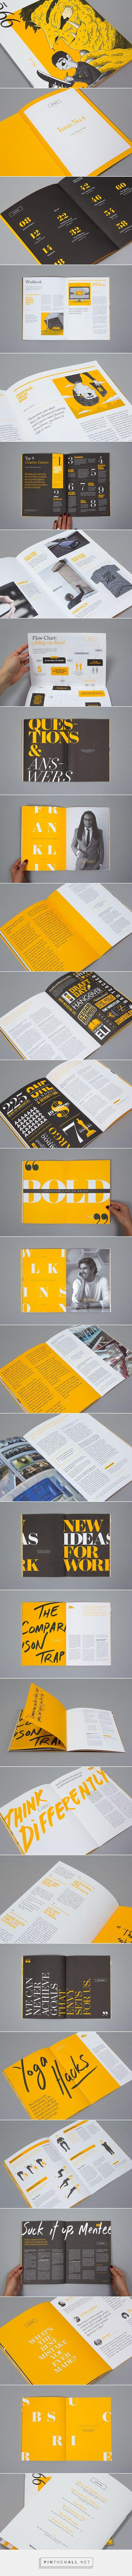 99U Quarterly Magazine Issue No4